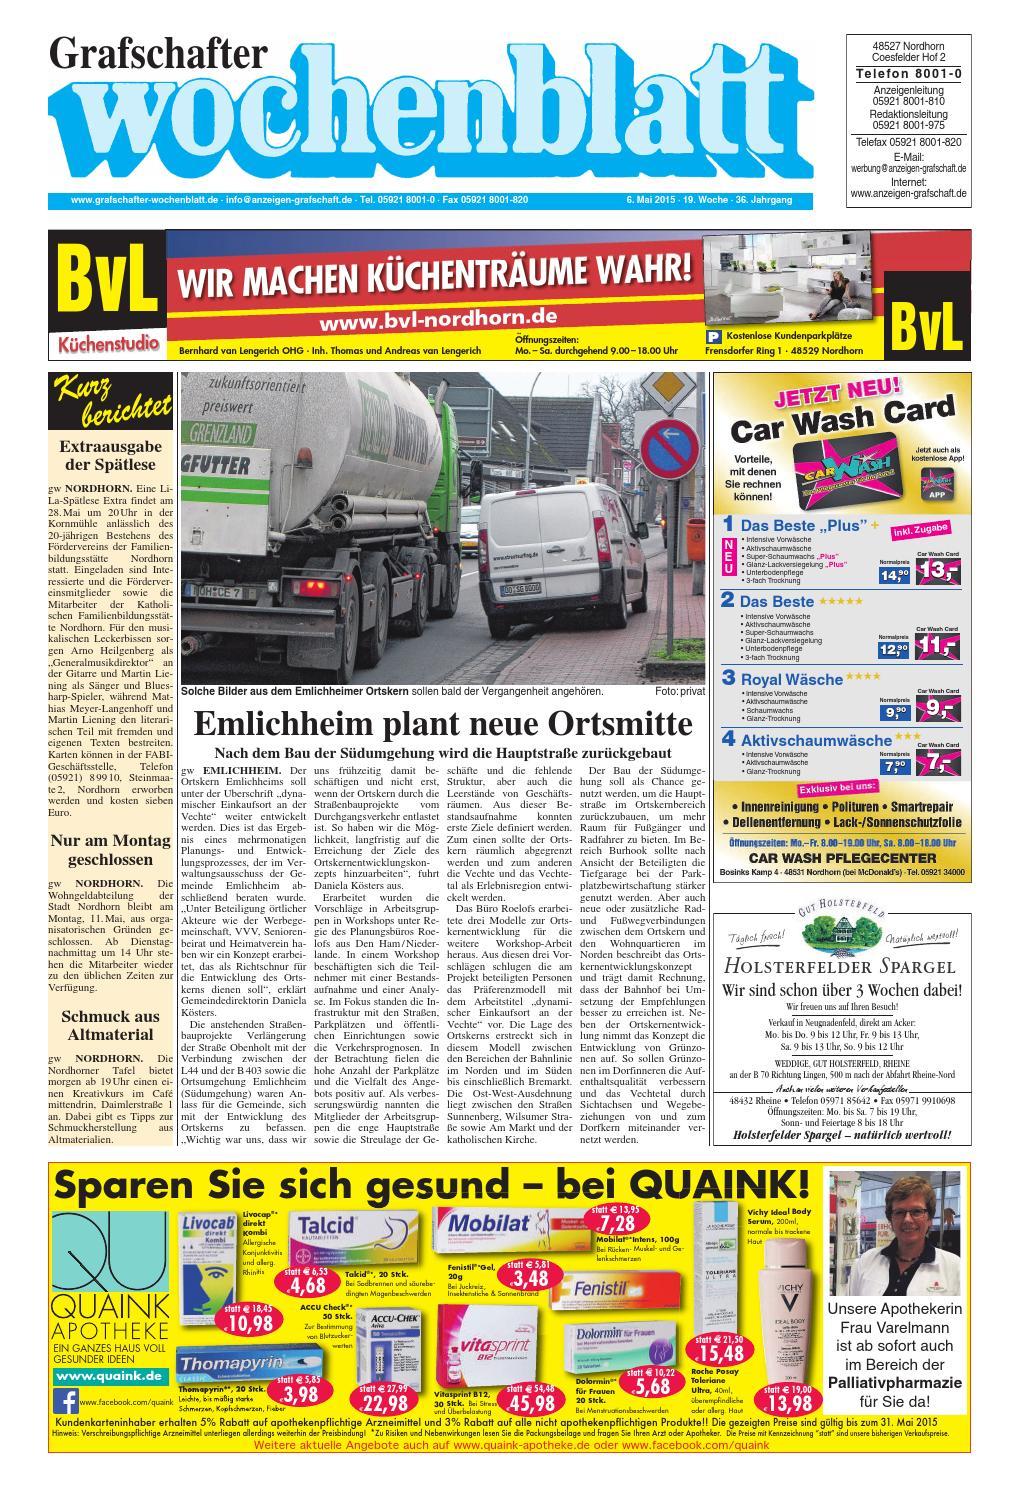 grafschafter wochenblatt 6 by sonntagszeitung issuu. Black Bedroom Furniture Sets. Home Design Ideas